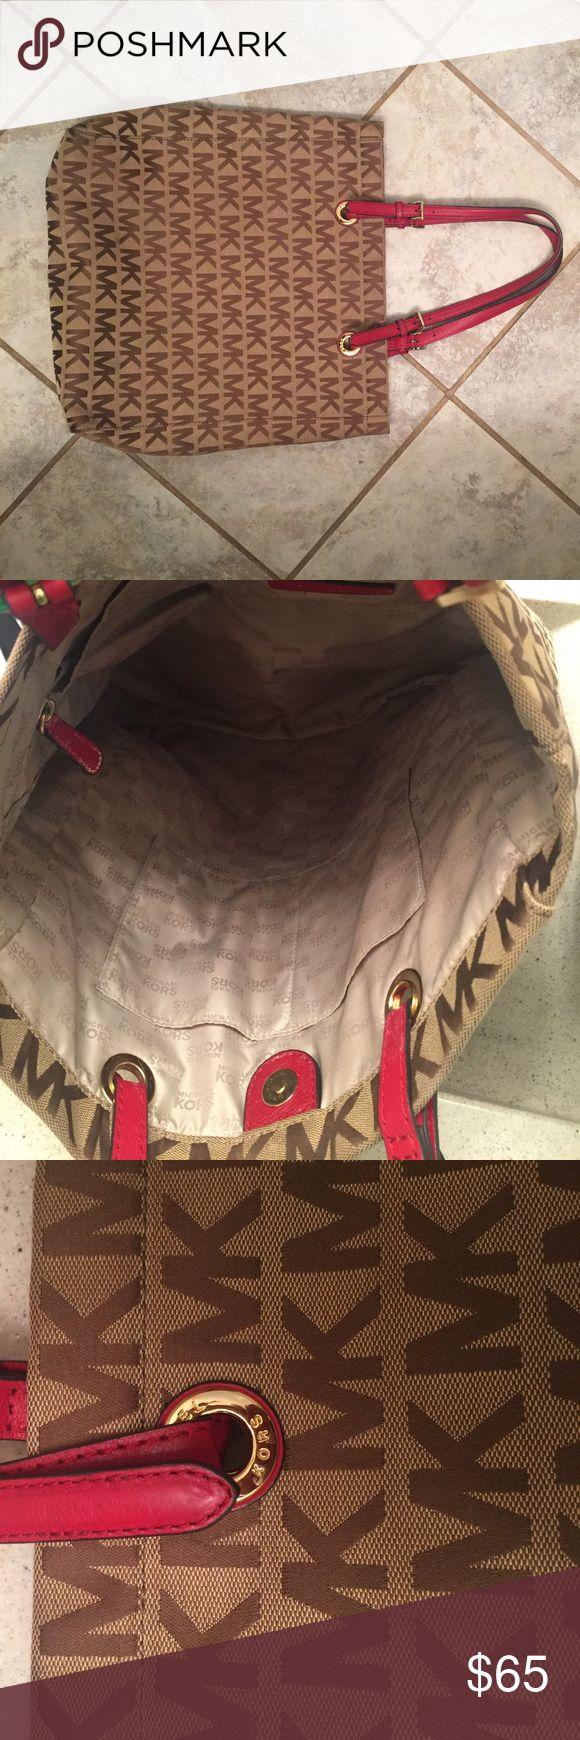 Beige and red Michael Kors bag ❤️ Larger Michael Kors bag. Beige with red accents. ❤️ KORS Michael Kors Bags Shoulder Bags